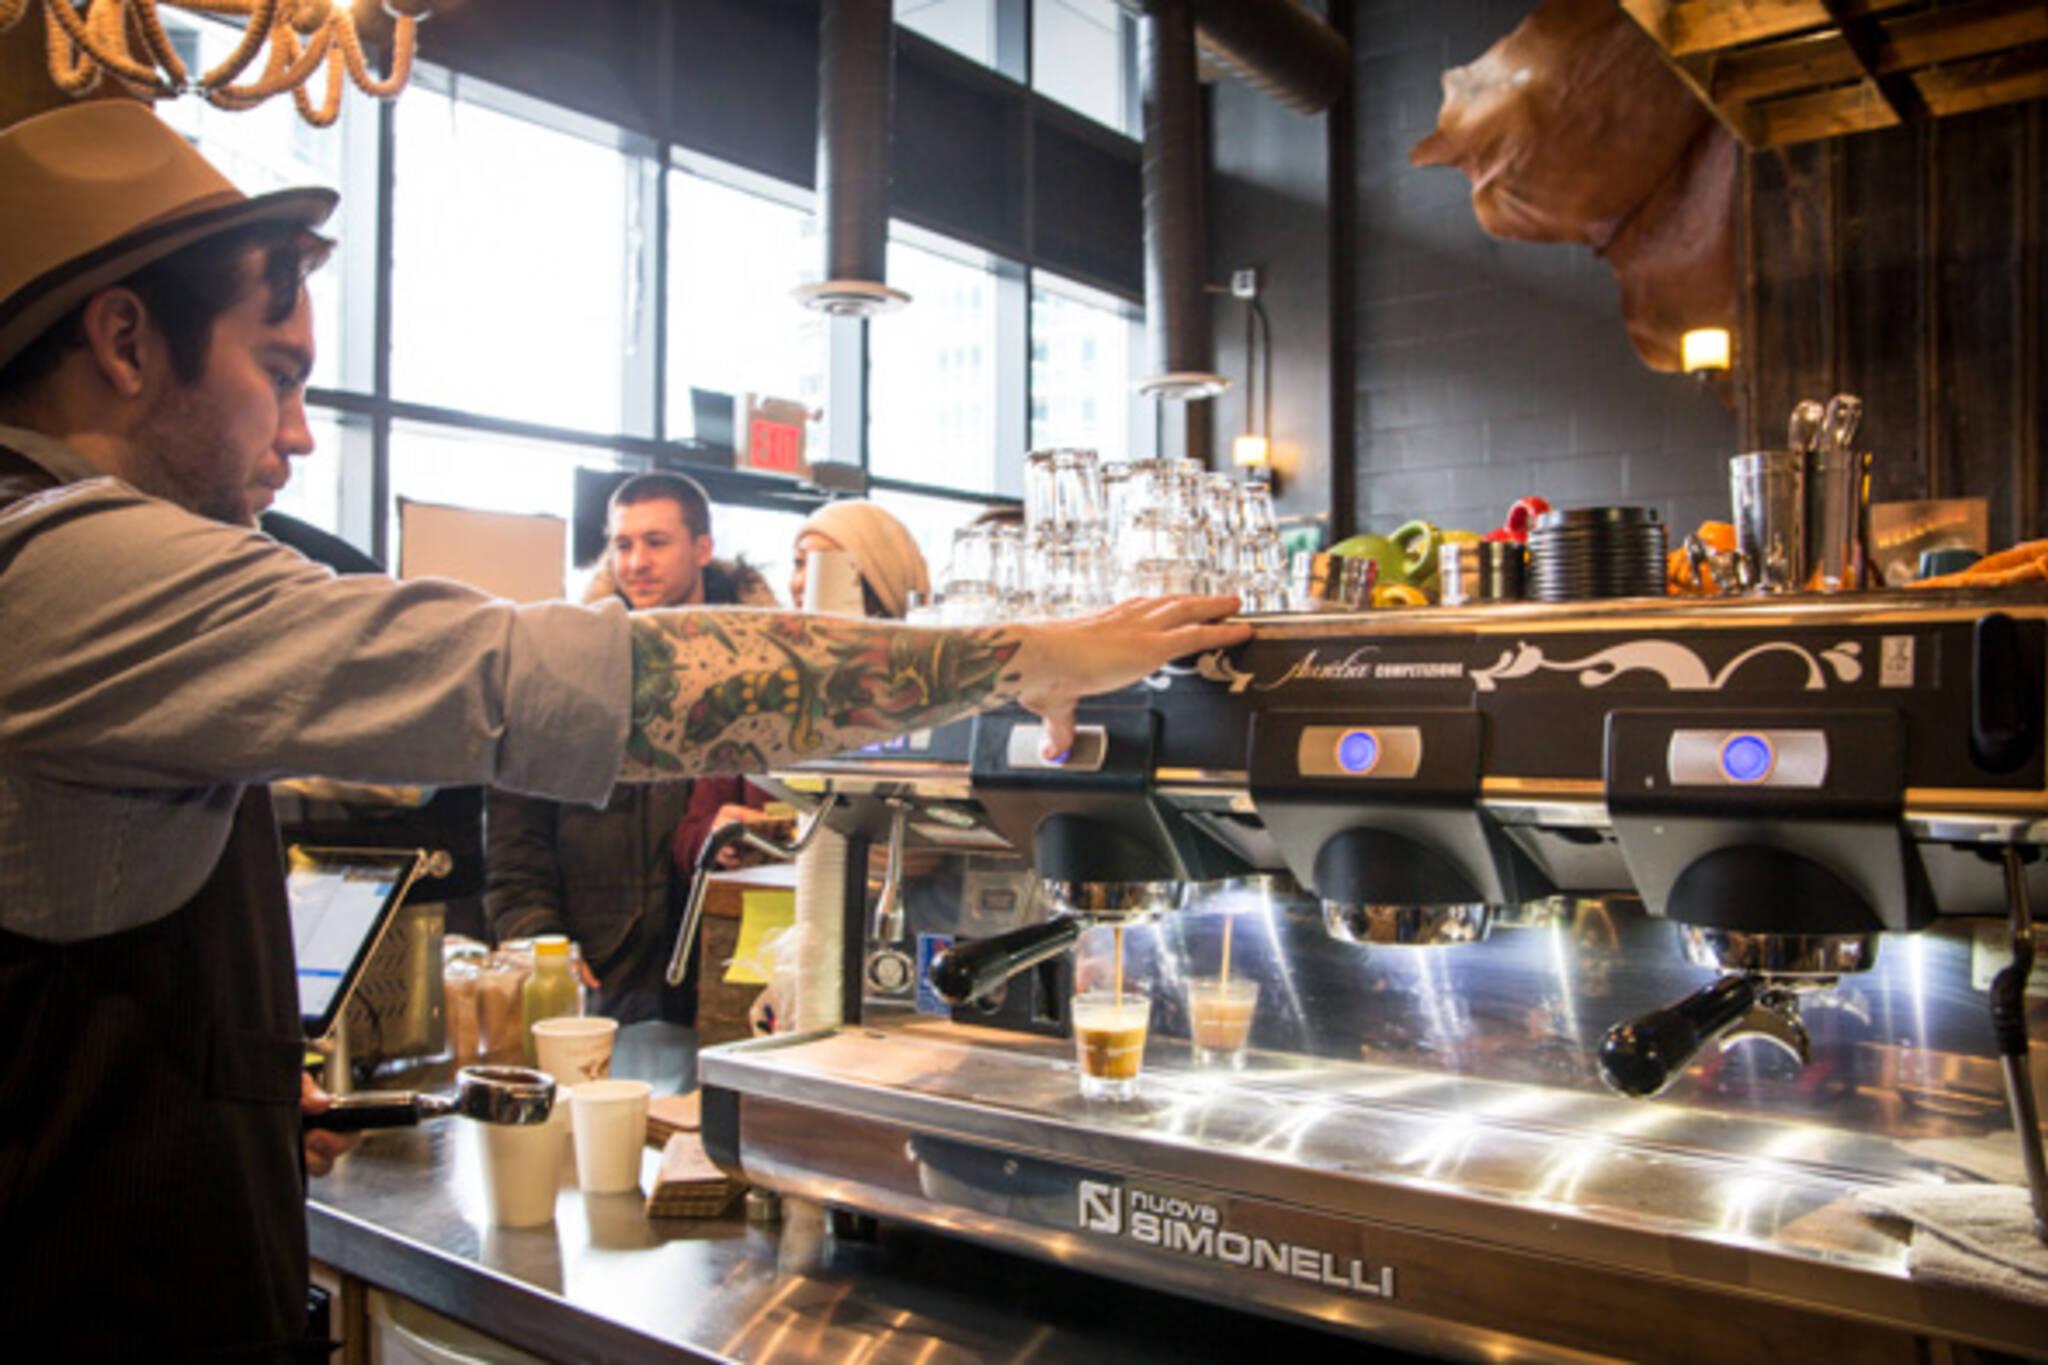 The Coffee bar toronto